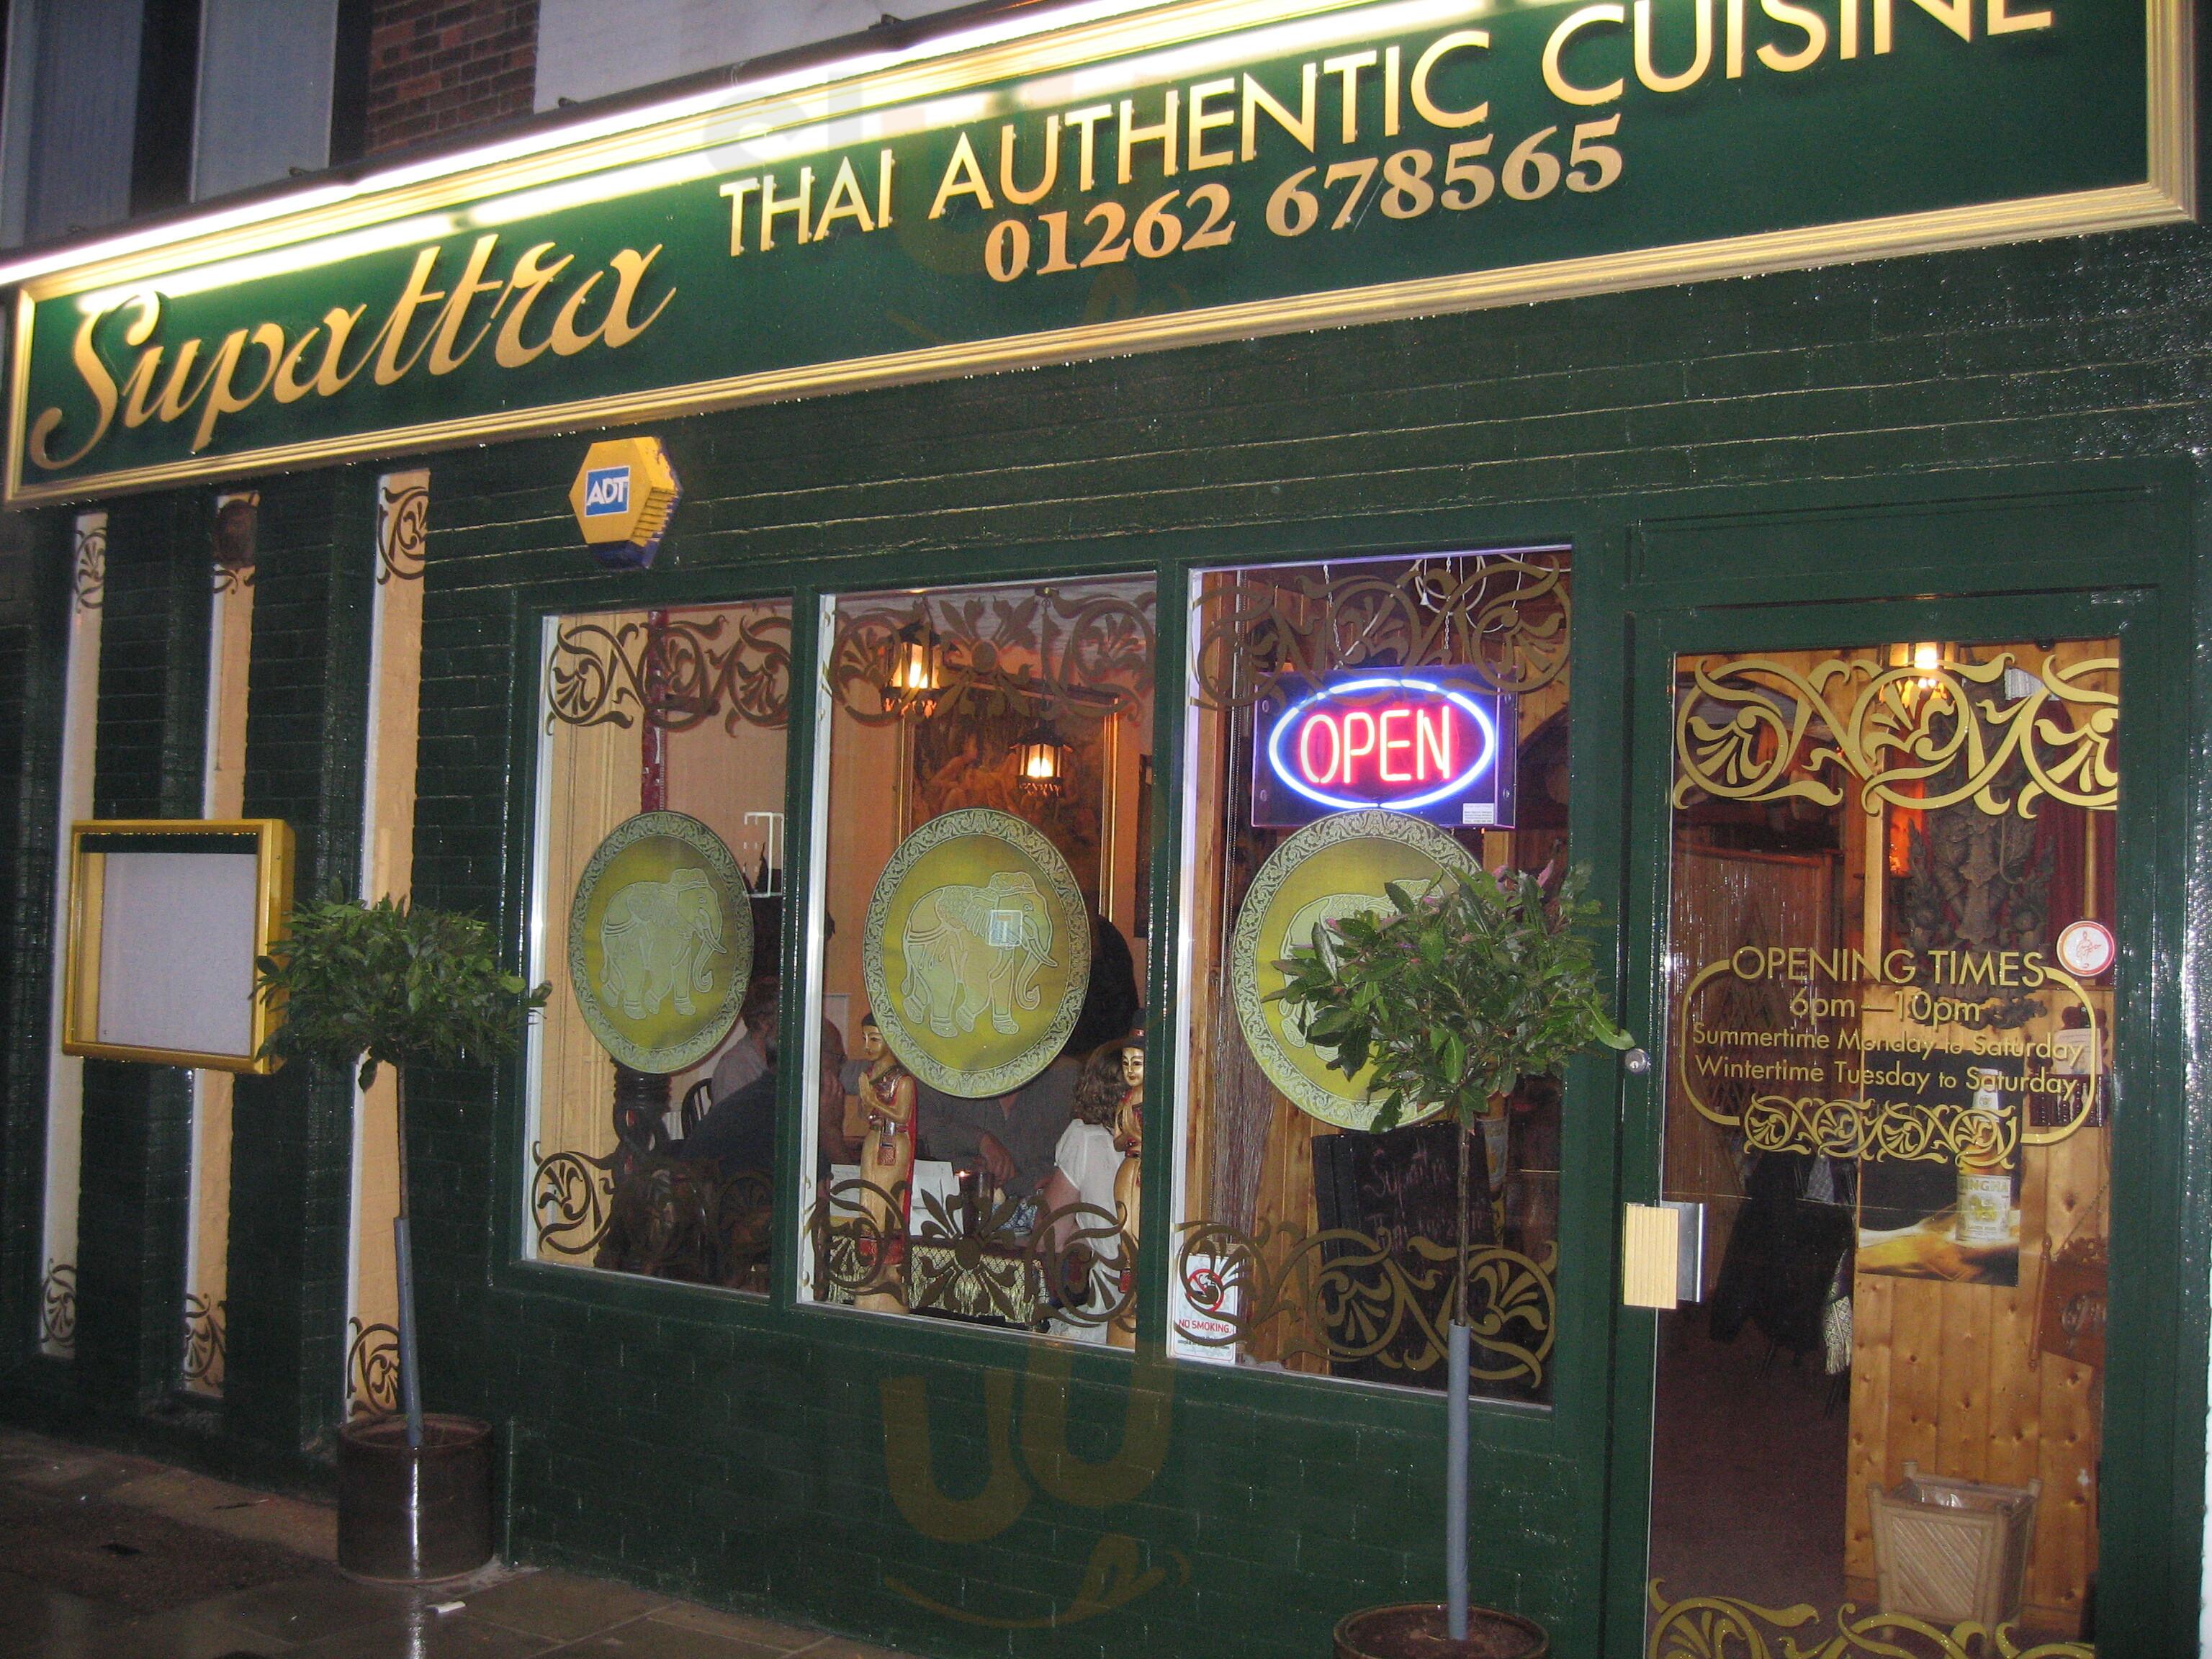 Supattra Thai Restaurant, Bridlington